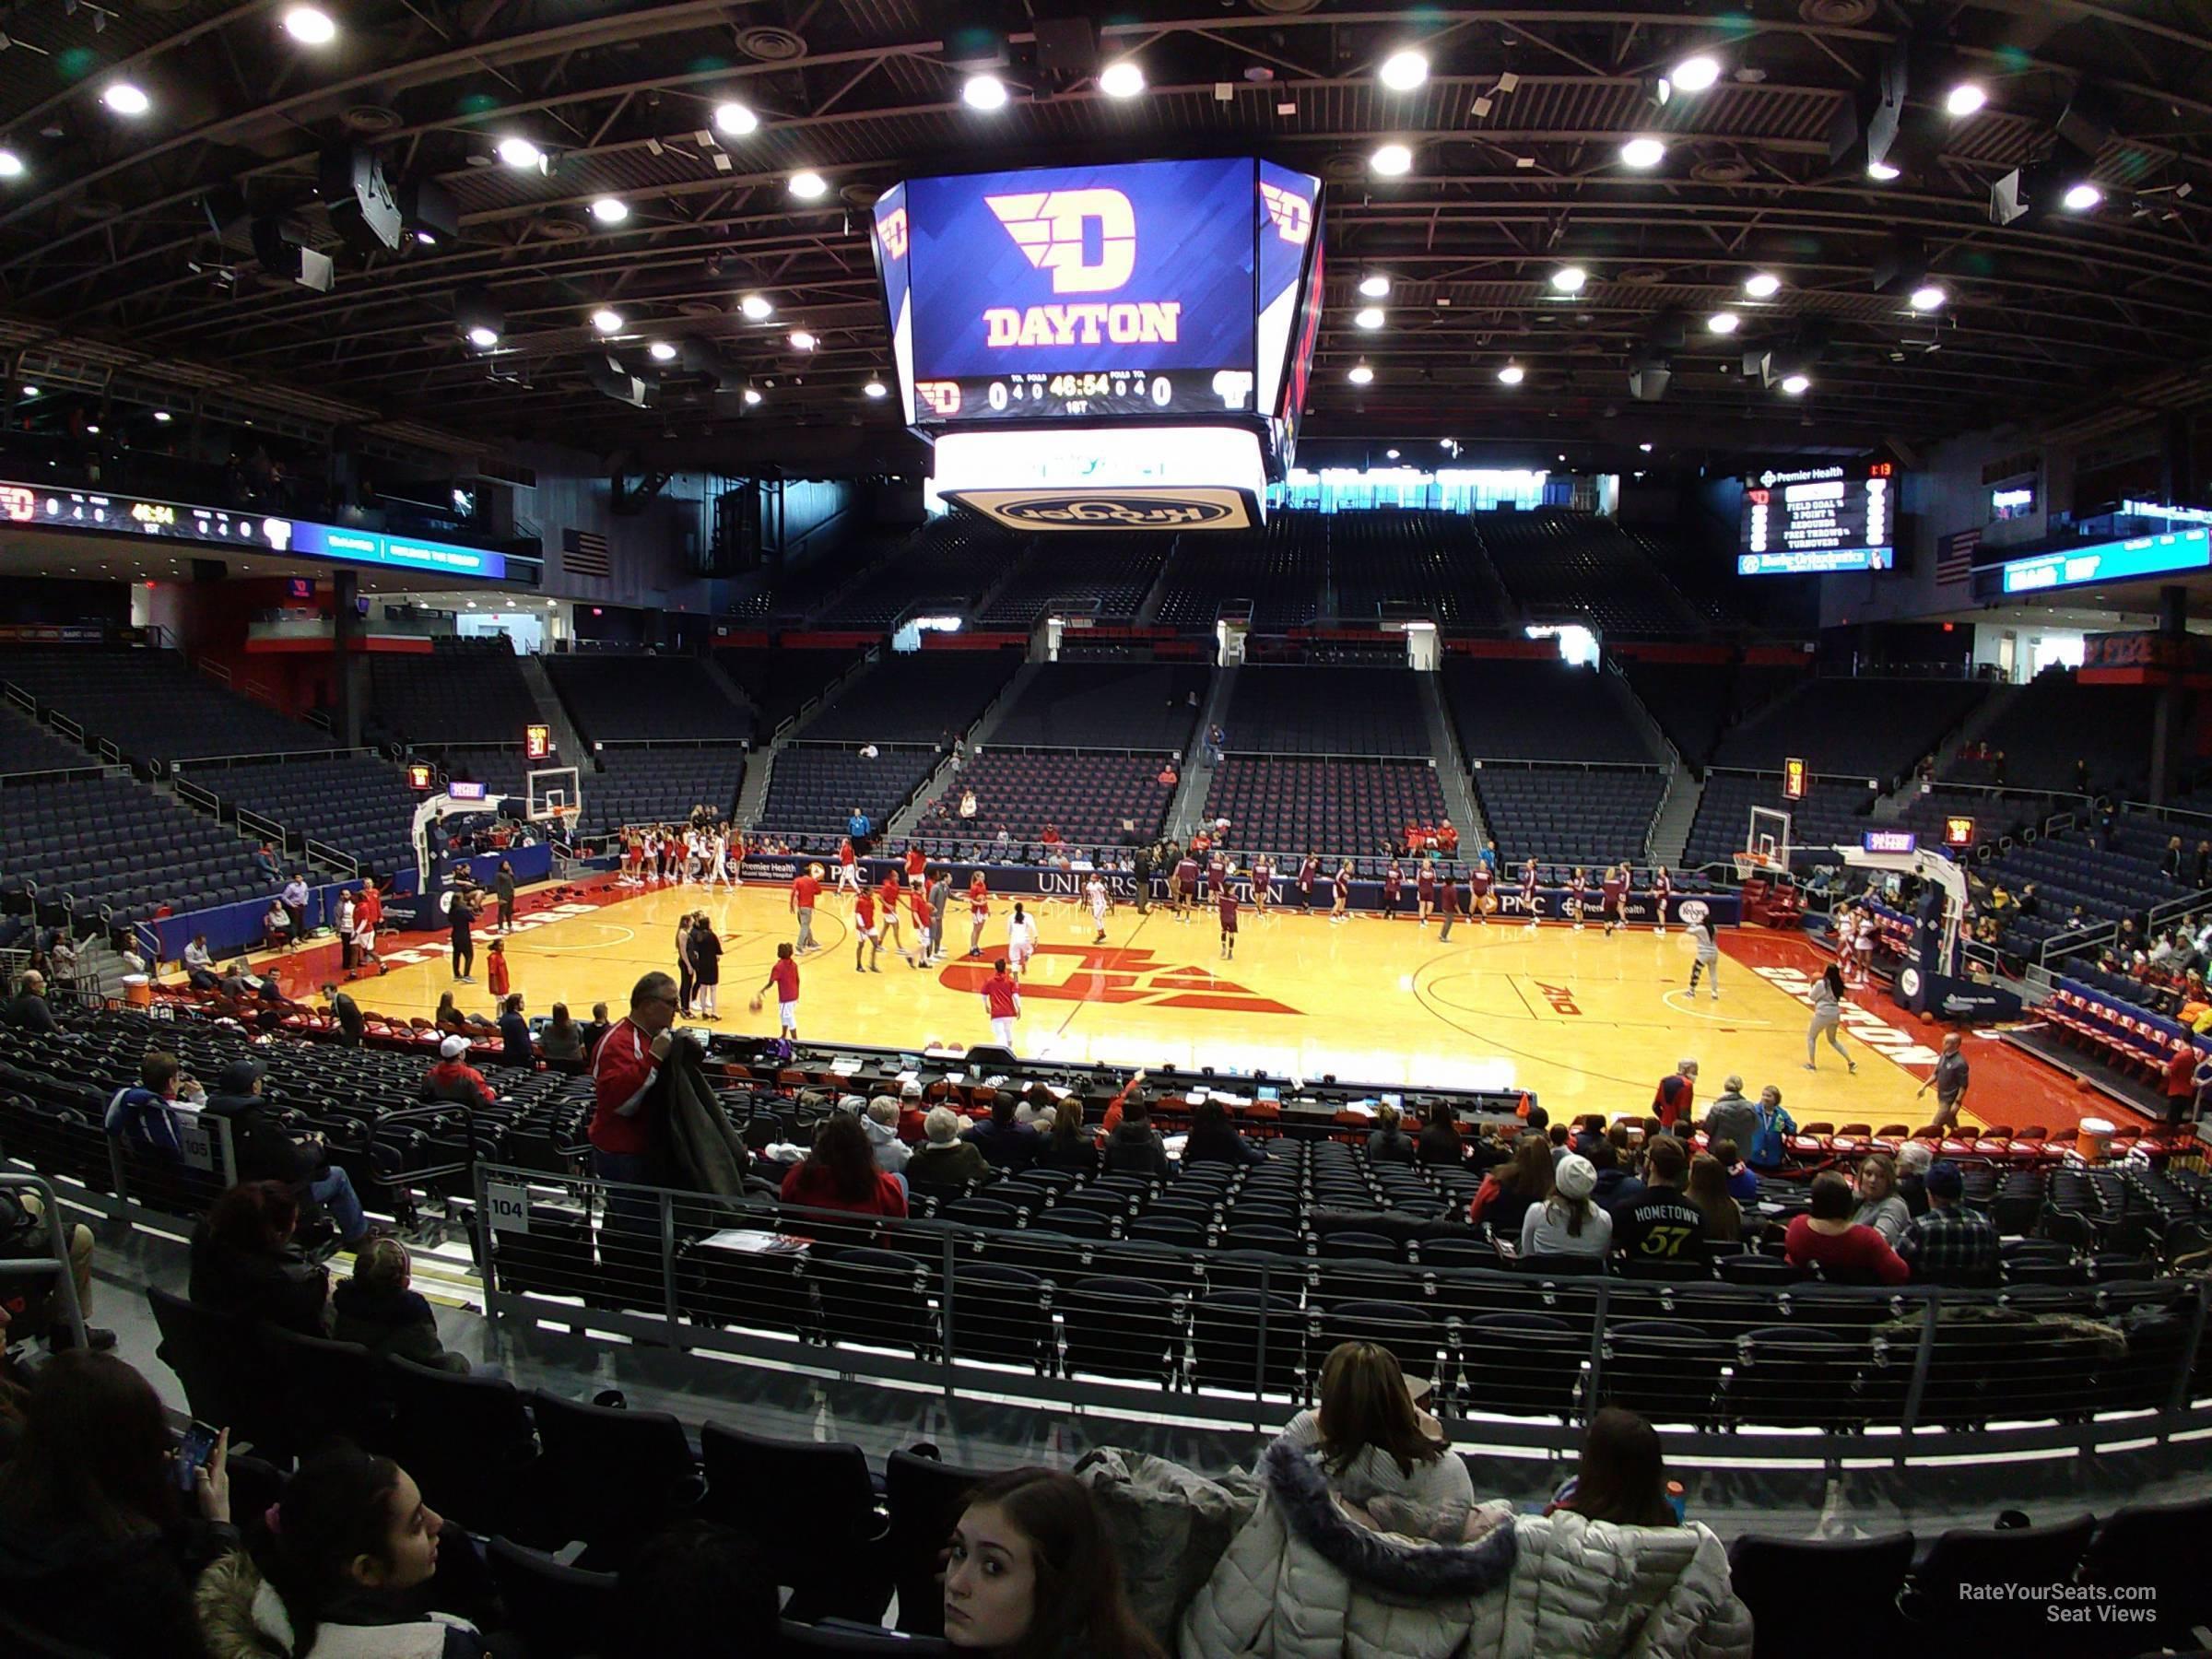 University Of Dayton Arena Section 206 Rateyourseatscom